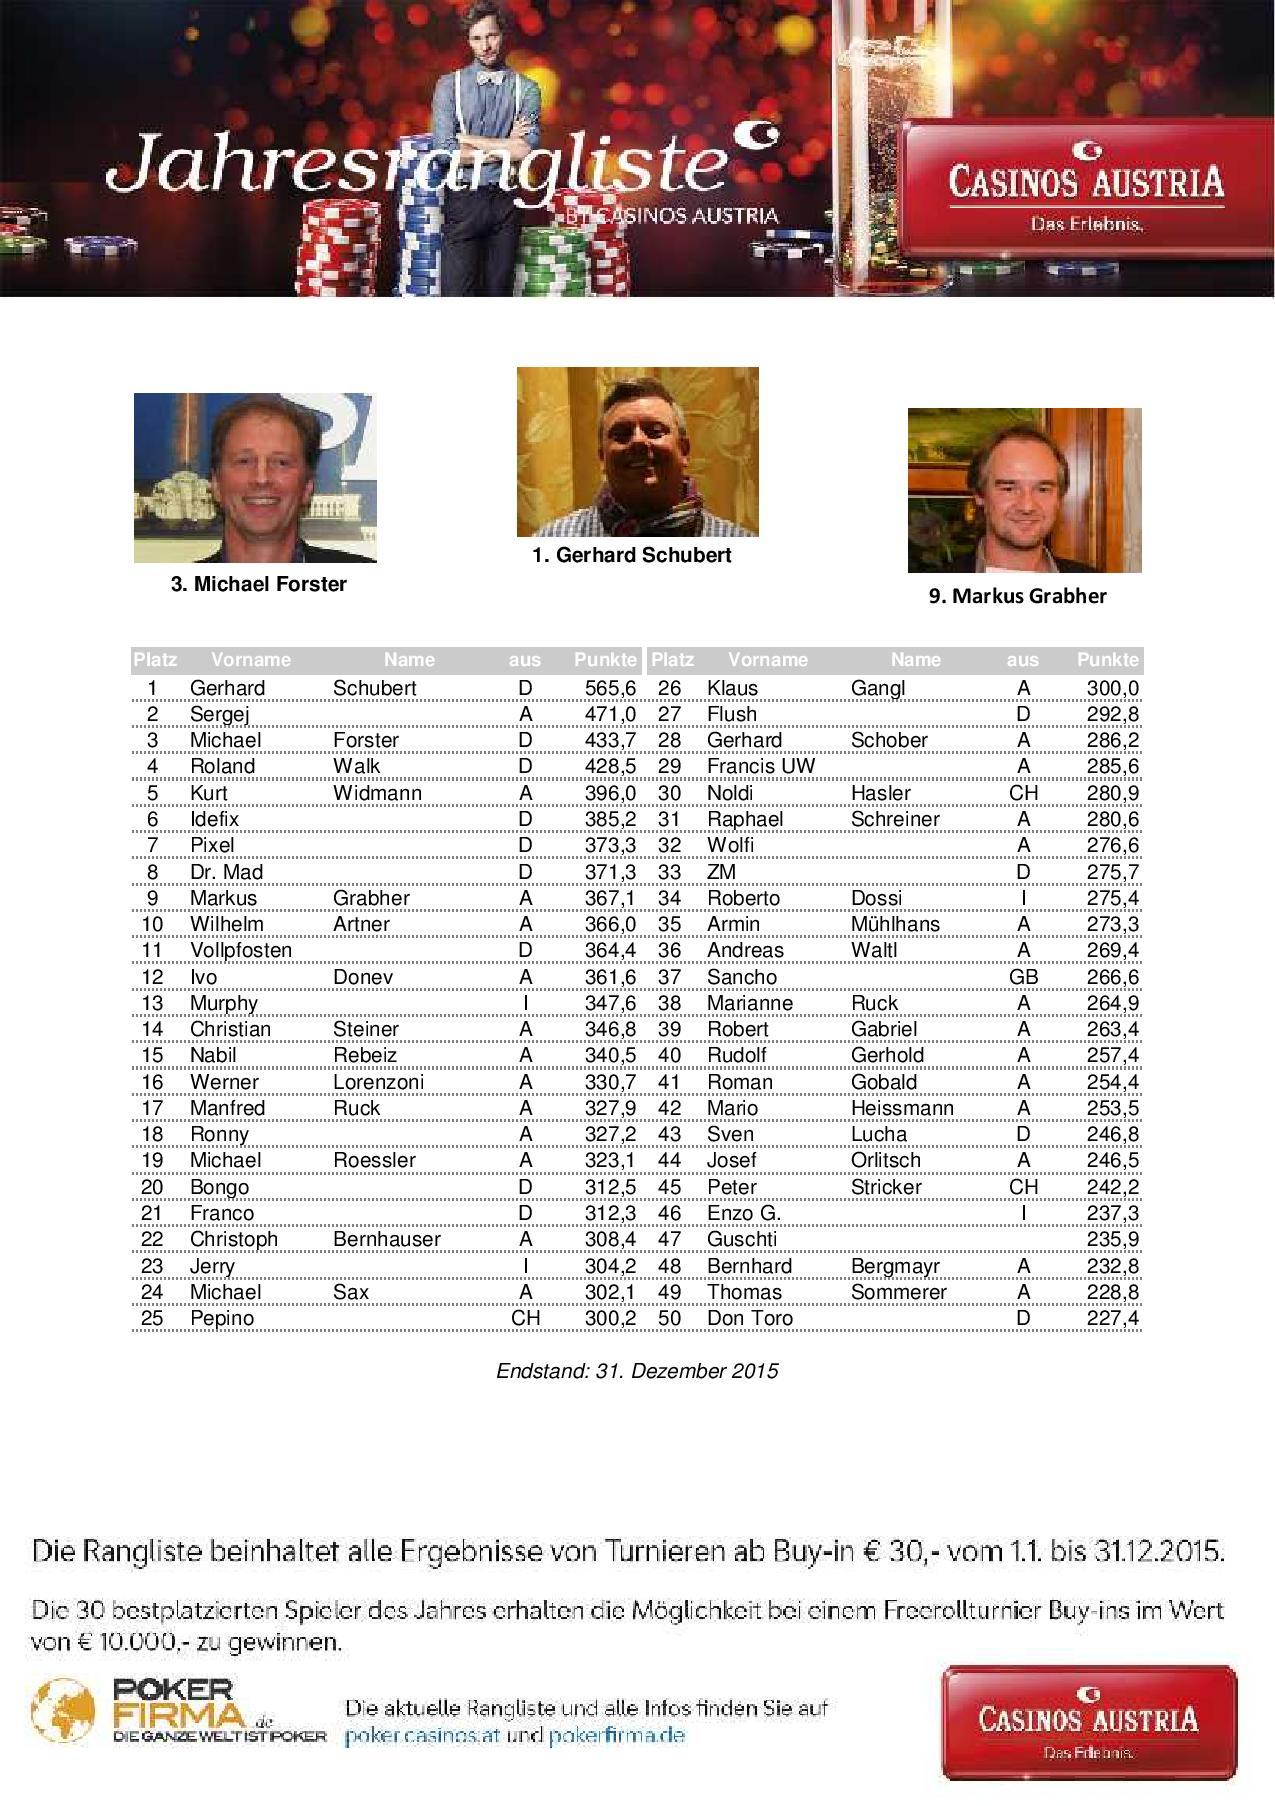 casino austria poker rangliste